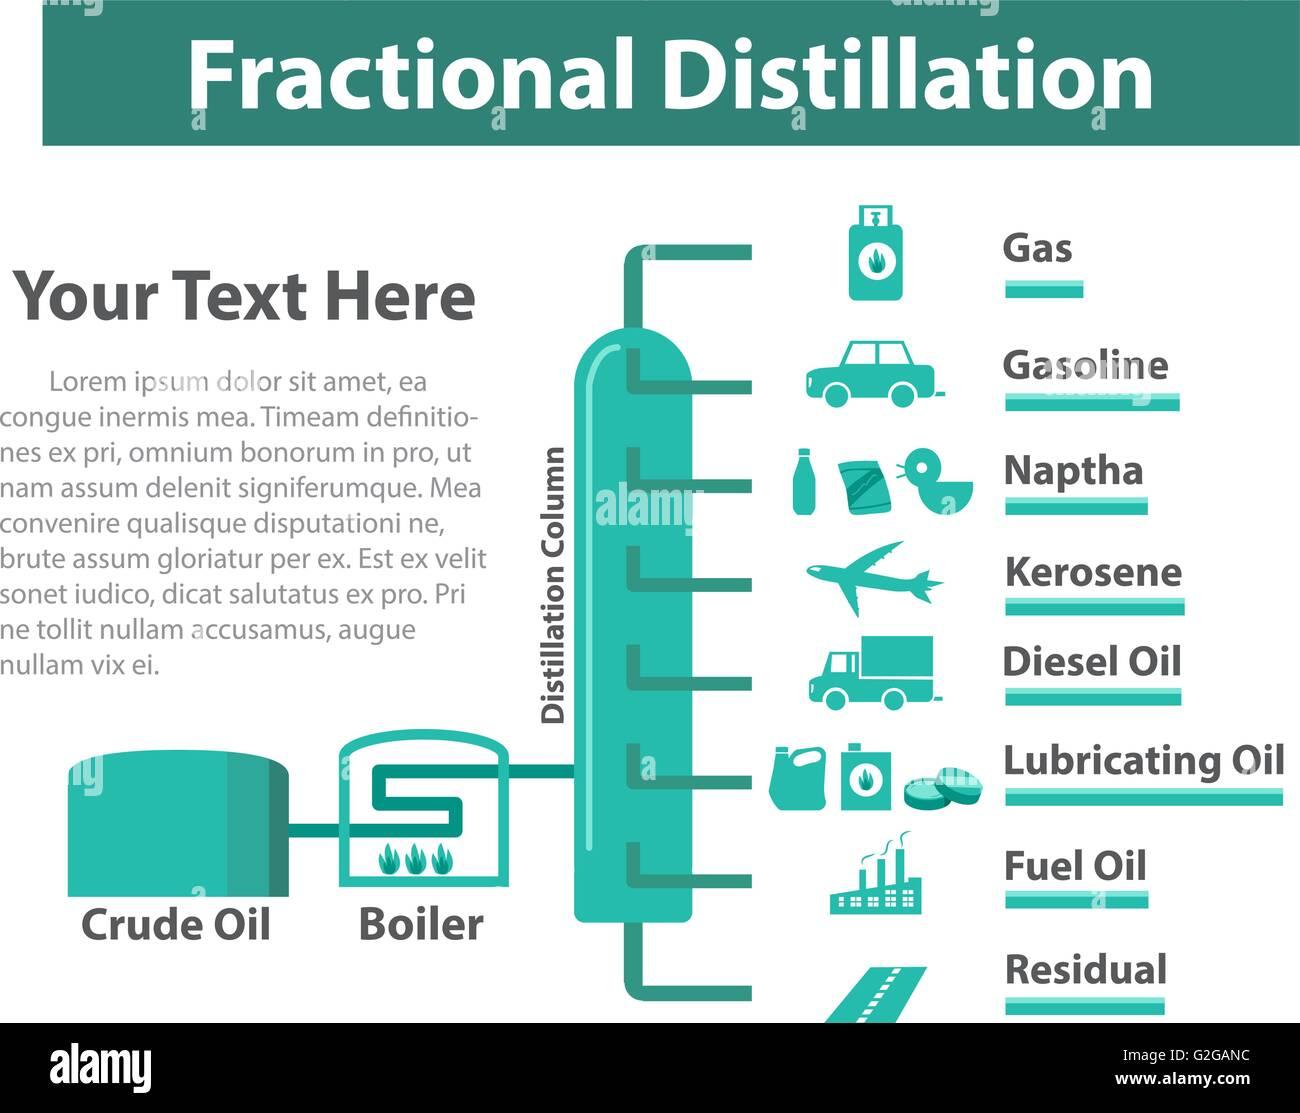 Fractional Distillation Stock Photos & Fractional Distillation Stock